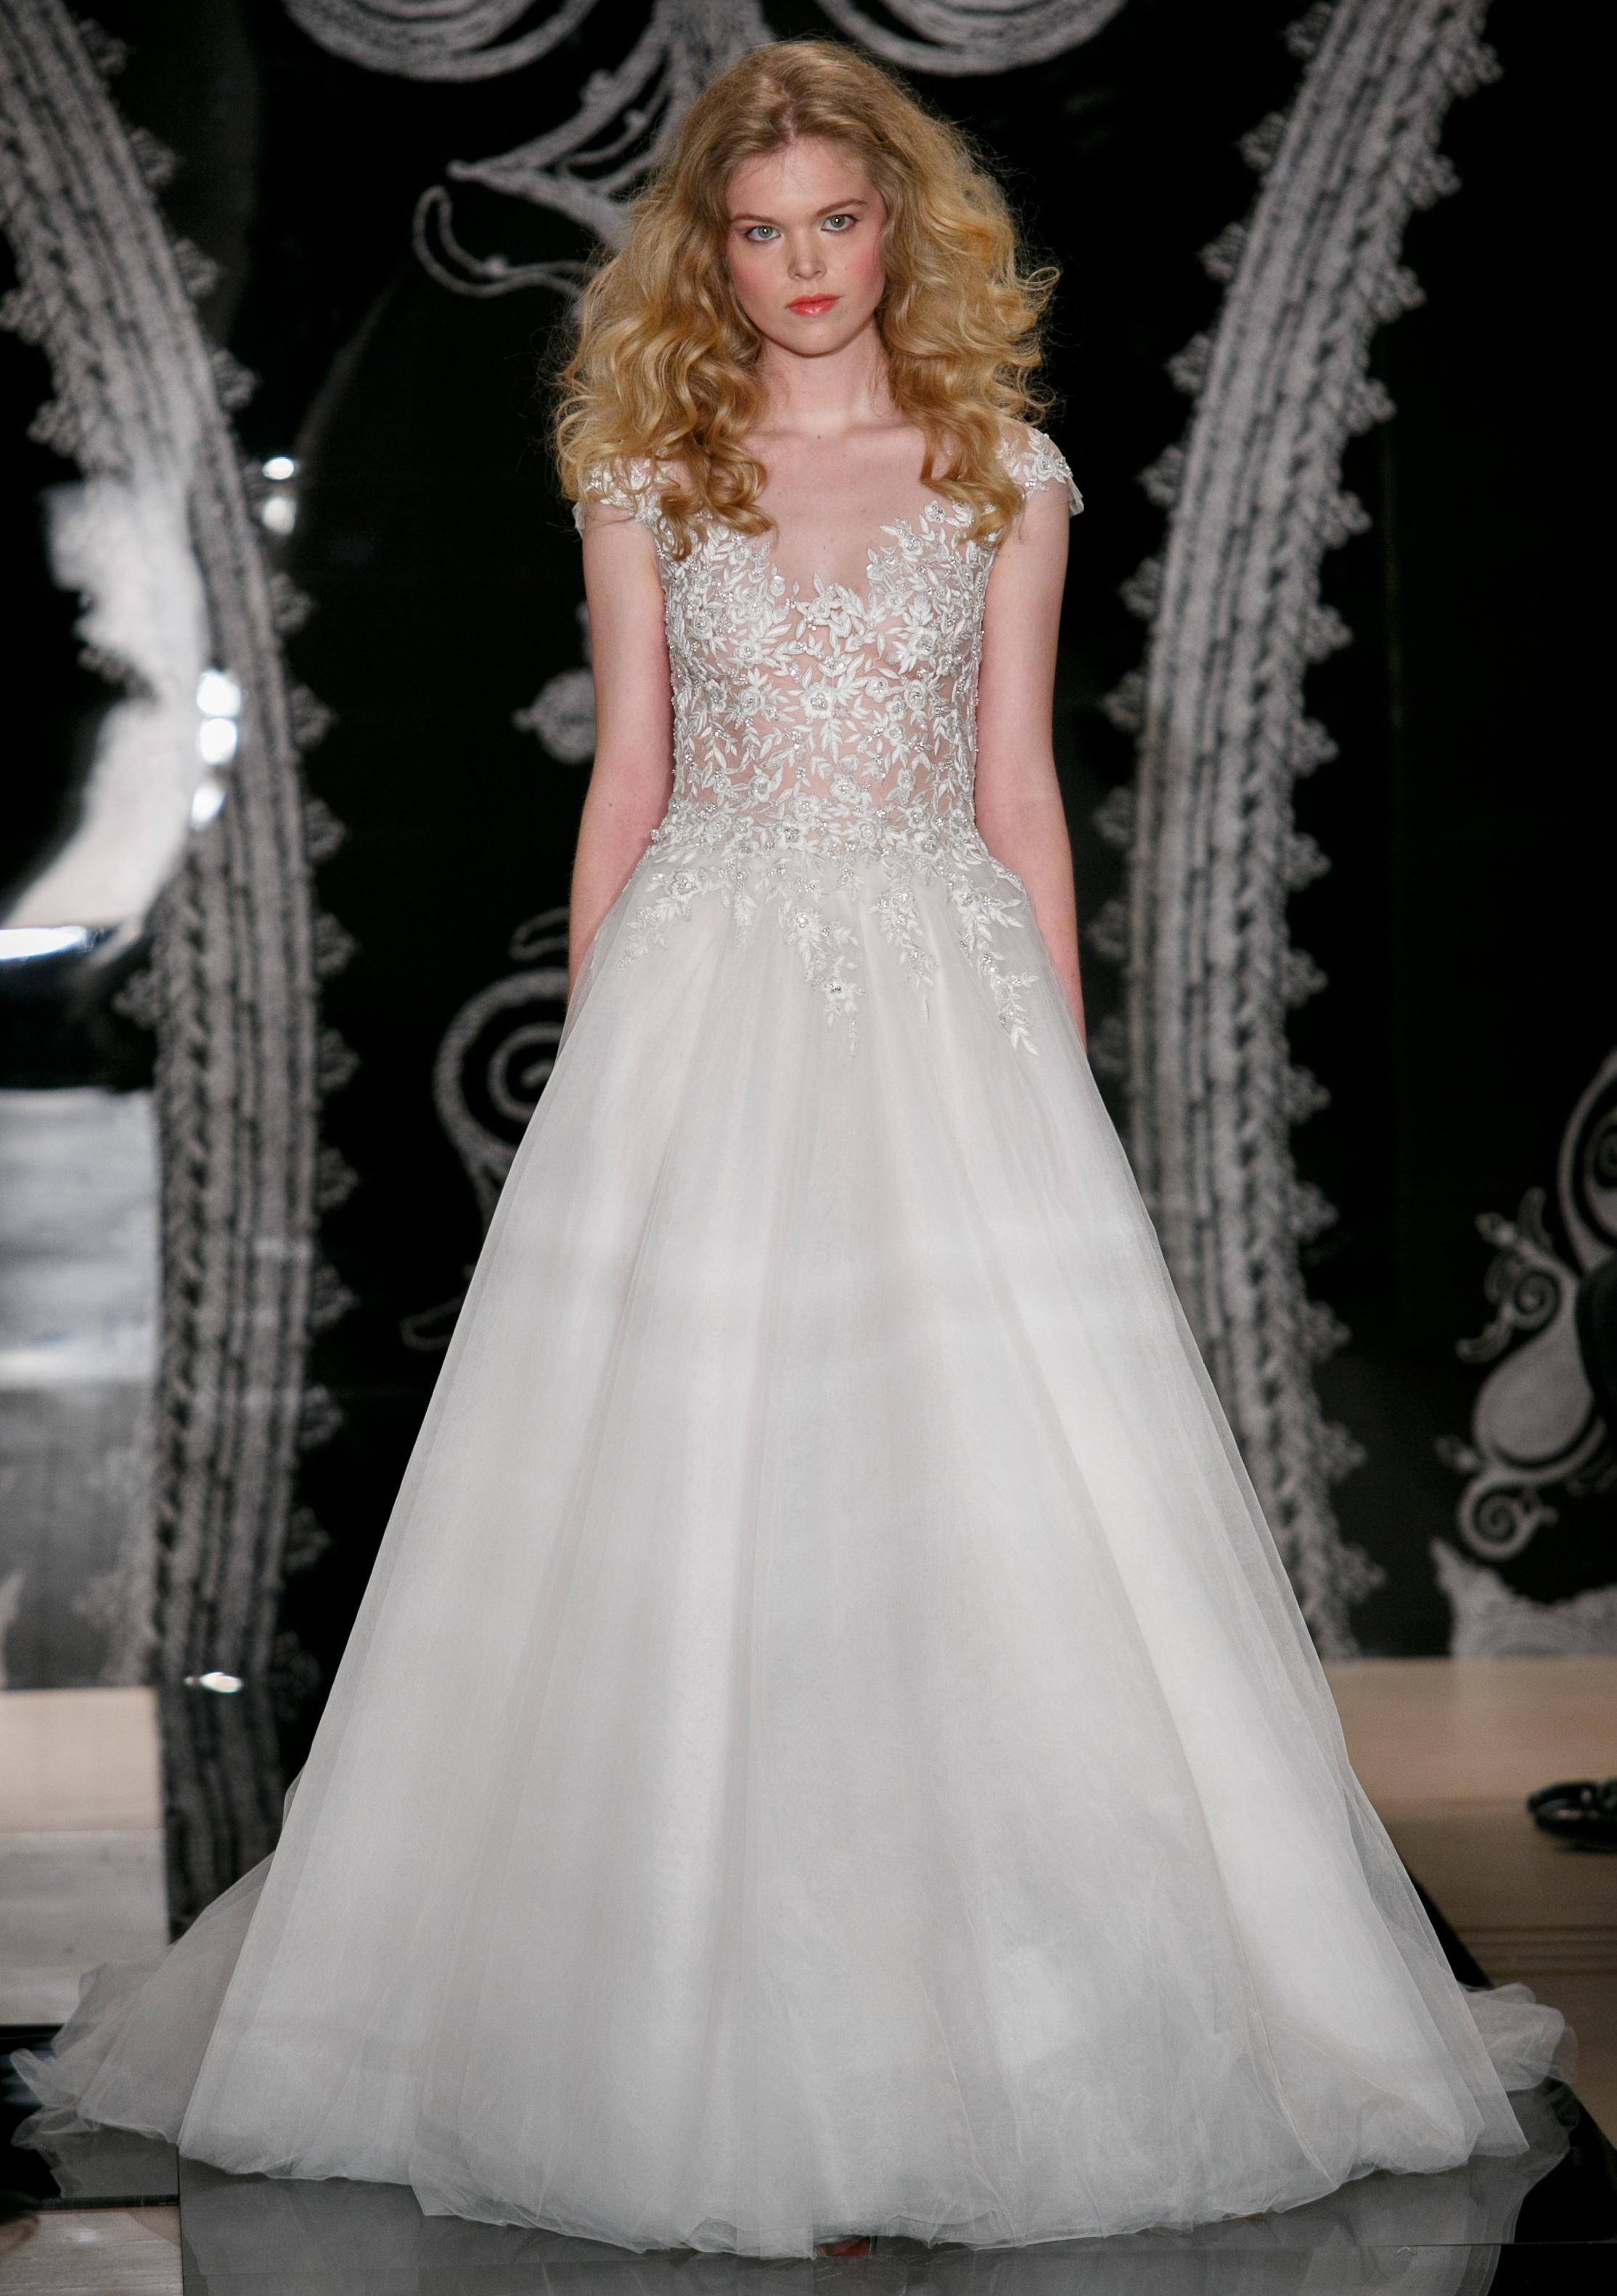 Reem Acra Wedding Gown 028 - Reem Acra Wedding Gown